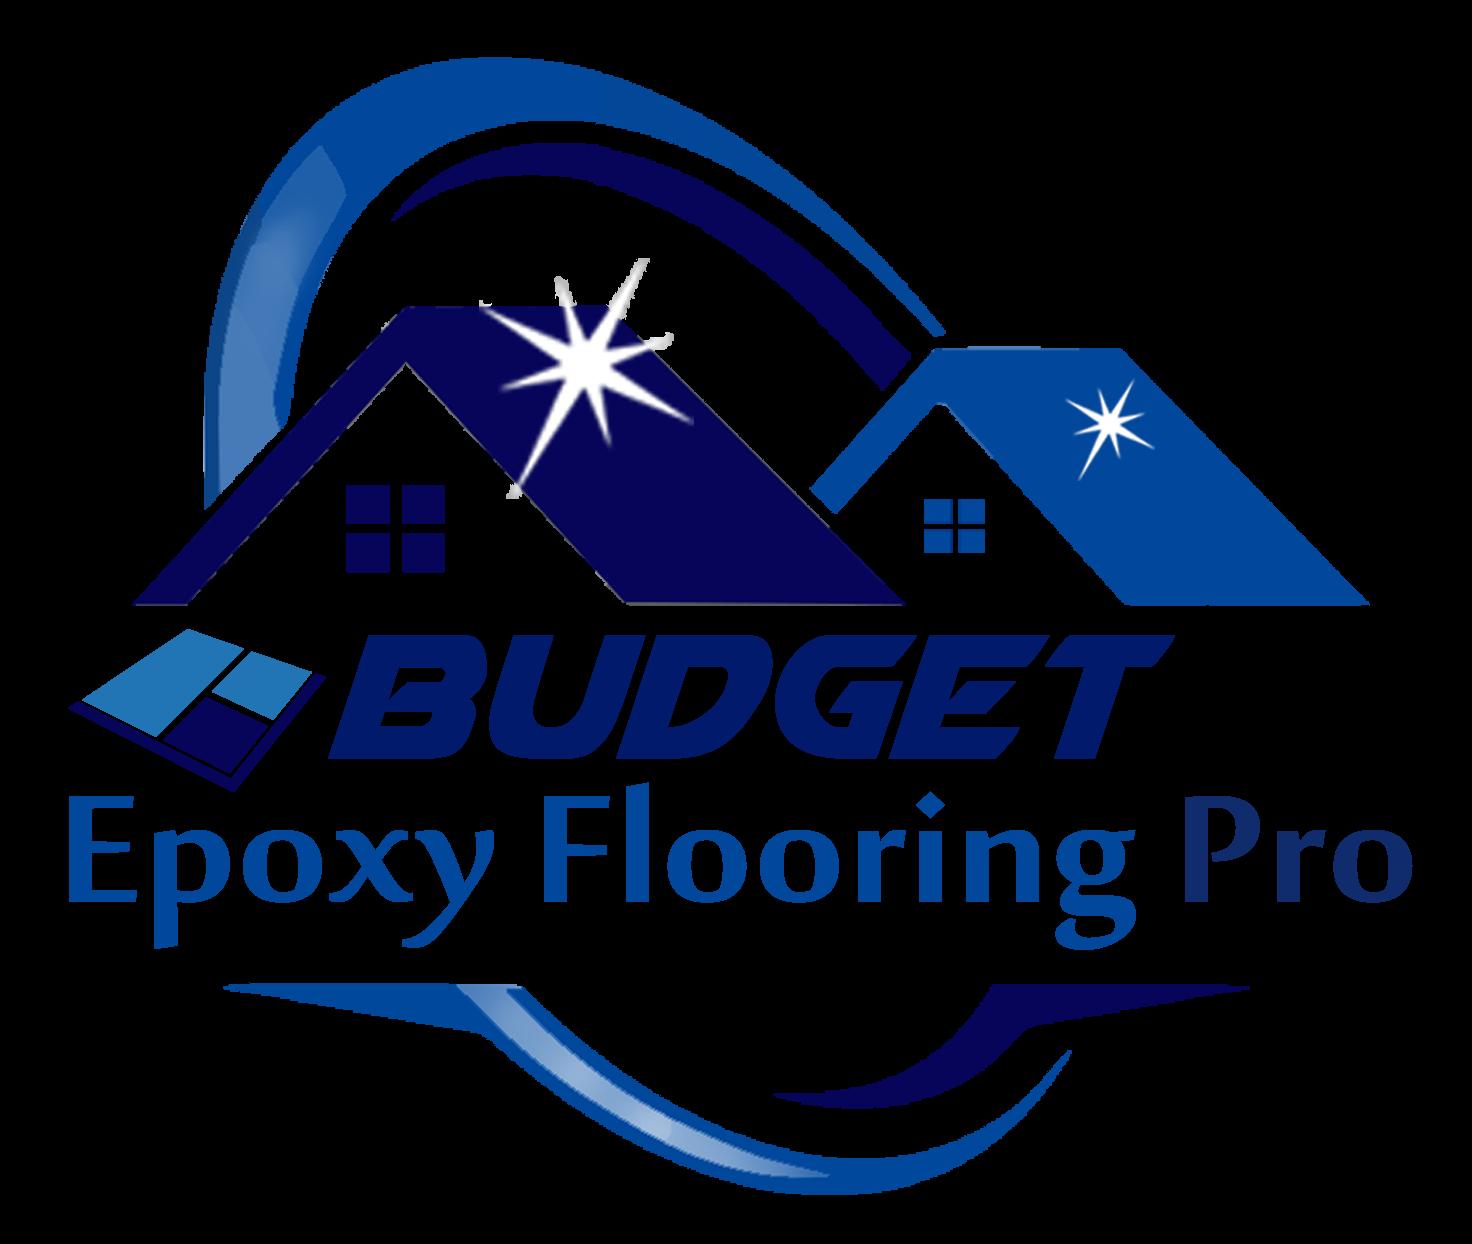 Budgert Epoxy Flooring Pro Logo